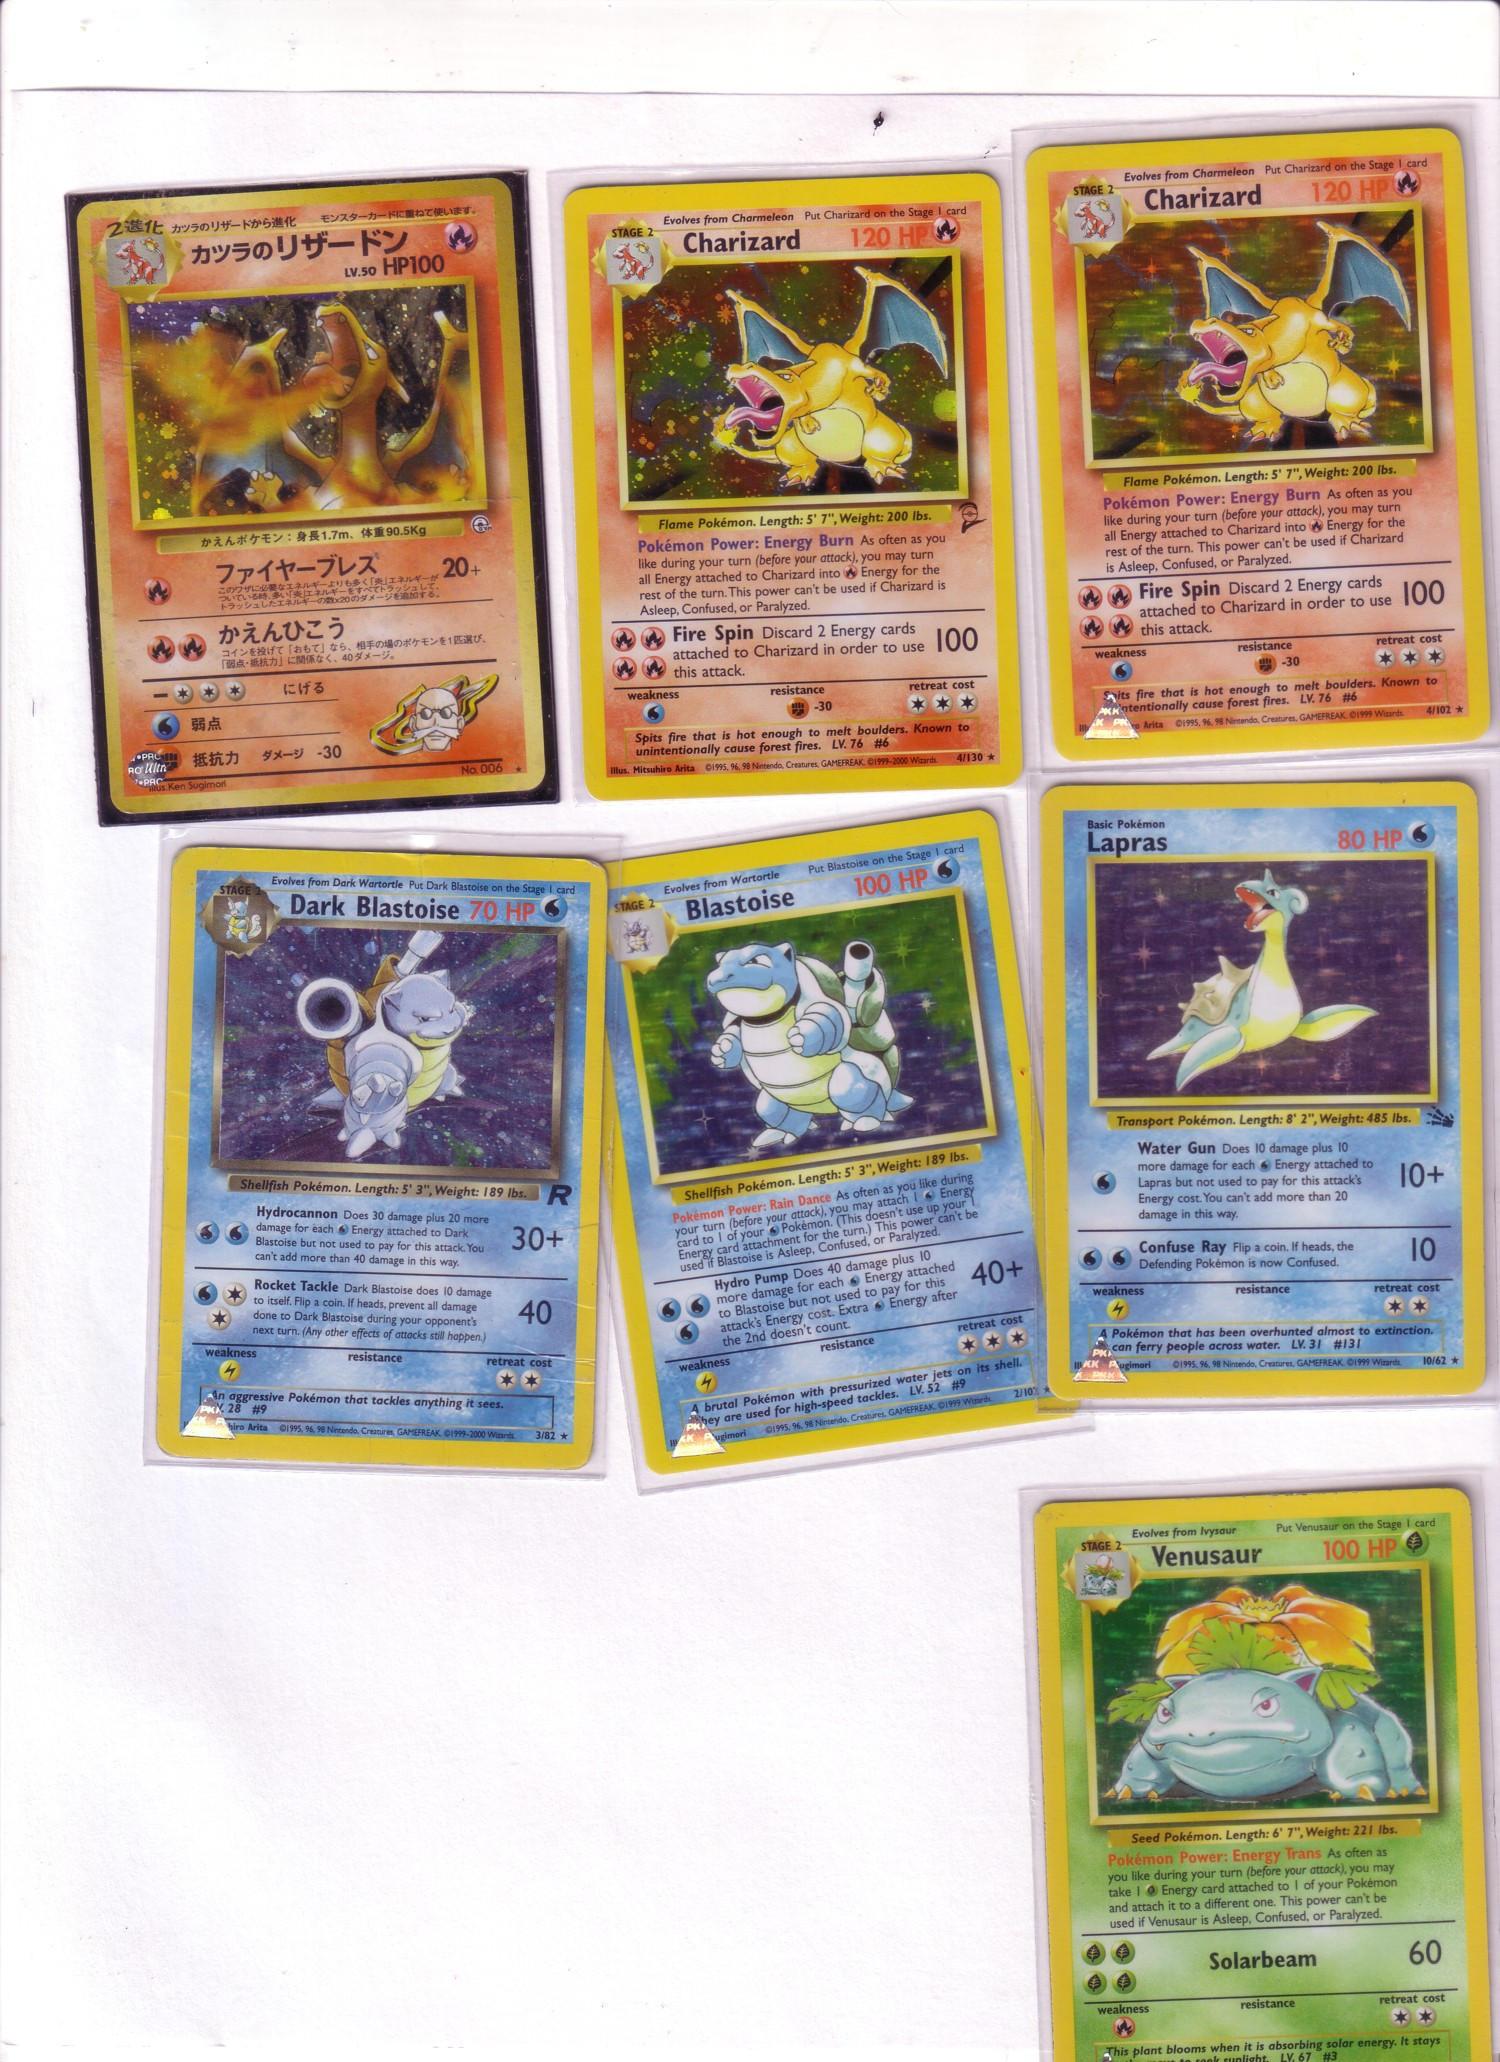 rare pokemon cards worth money - Pokemon Go Search for ...